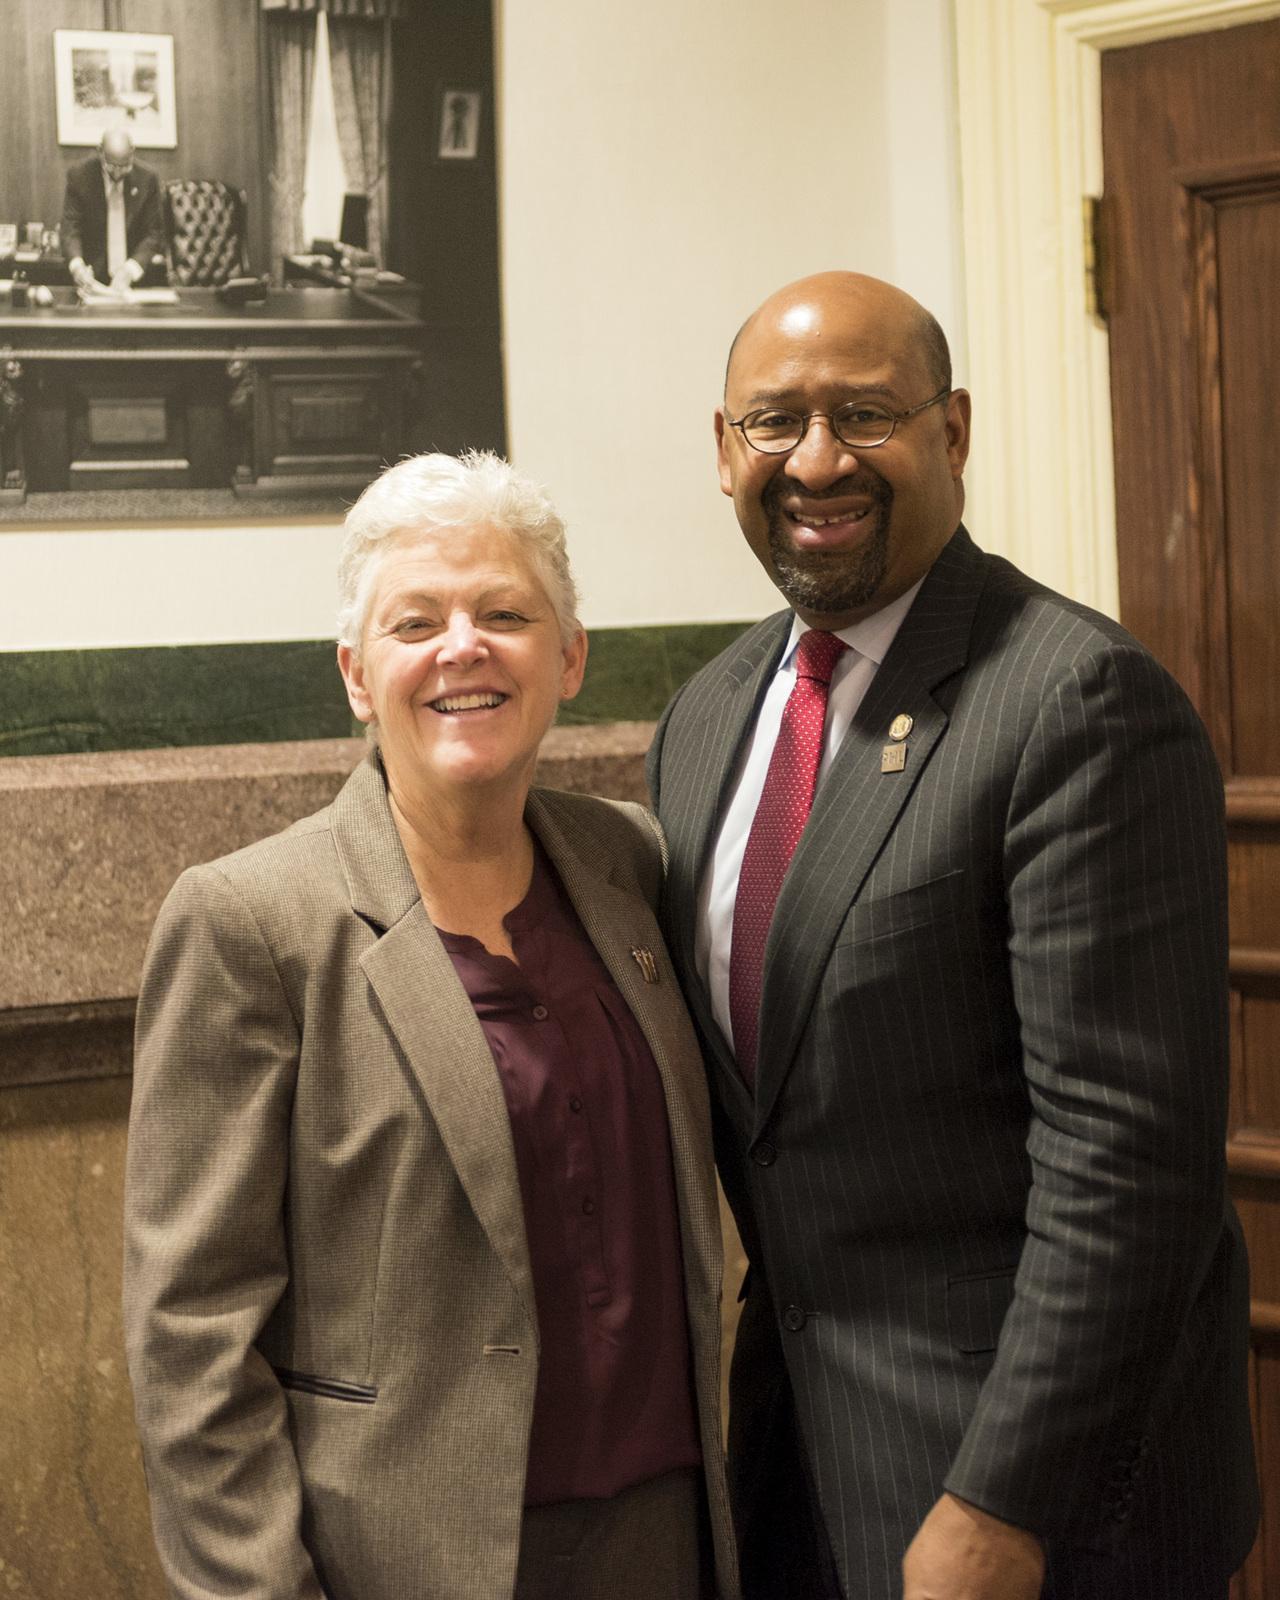 Office of the Administrator - Philadelphia - Administrator Gina McCarthy visiting the Food Lab at Drexel University [412-APD-1265-2014-11-14_Philadelphia_045.jpg]